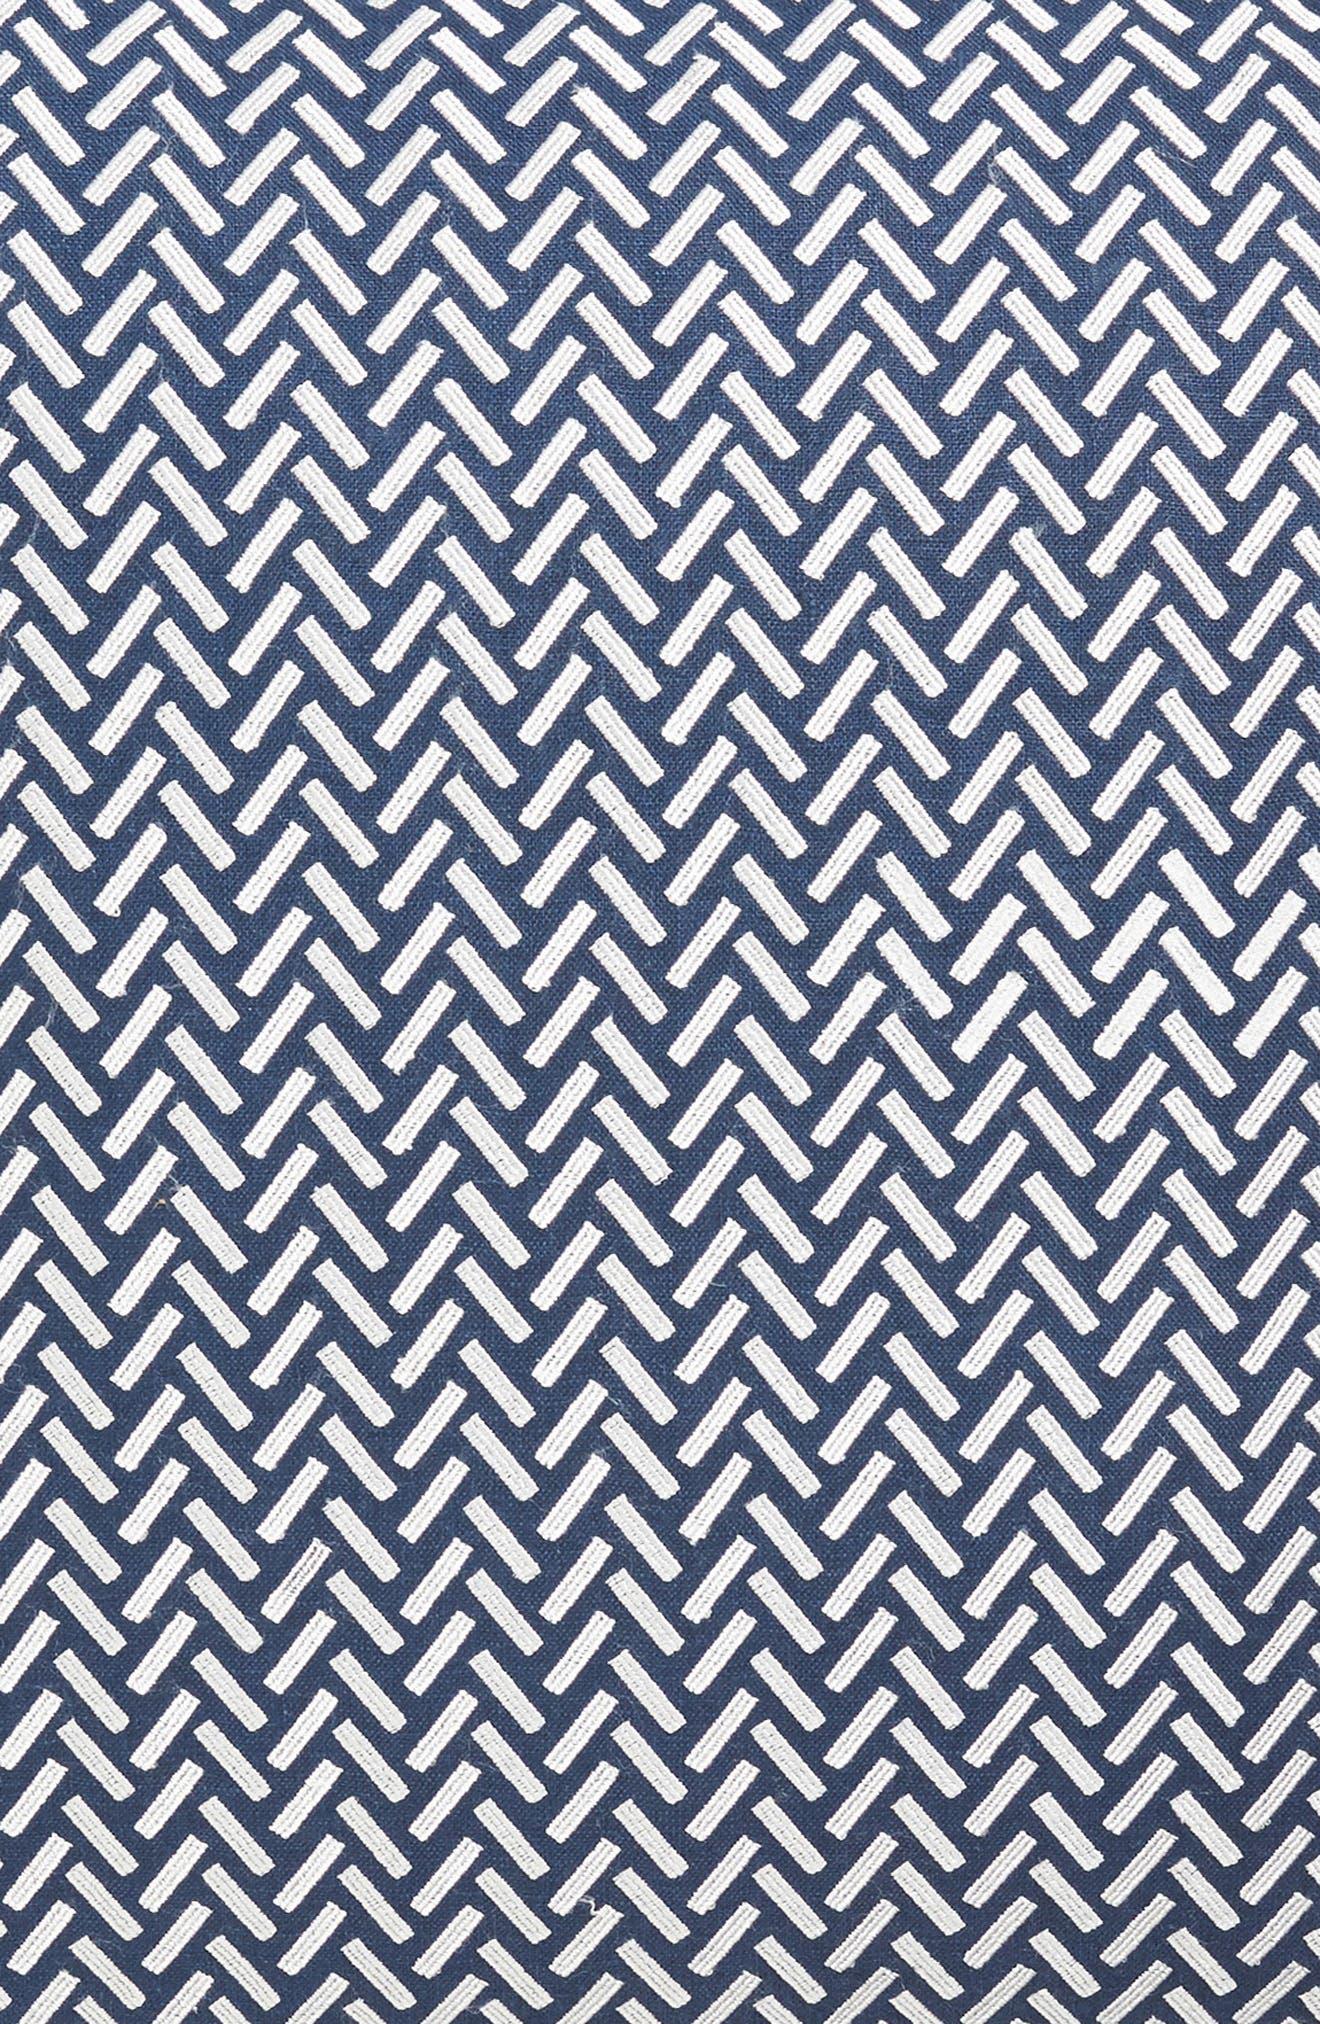 Corana Linen Pillow,                             Alternate thumbnail 3, color,                             NAVY/WHITE